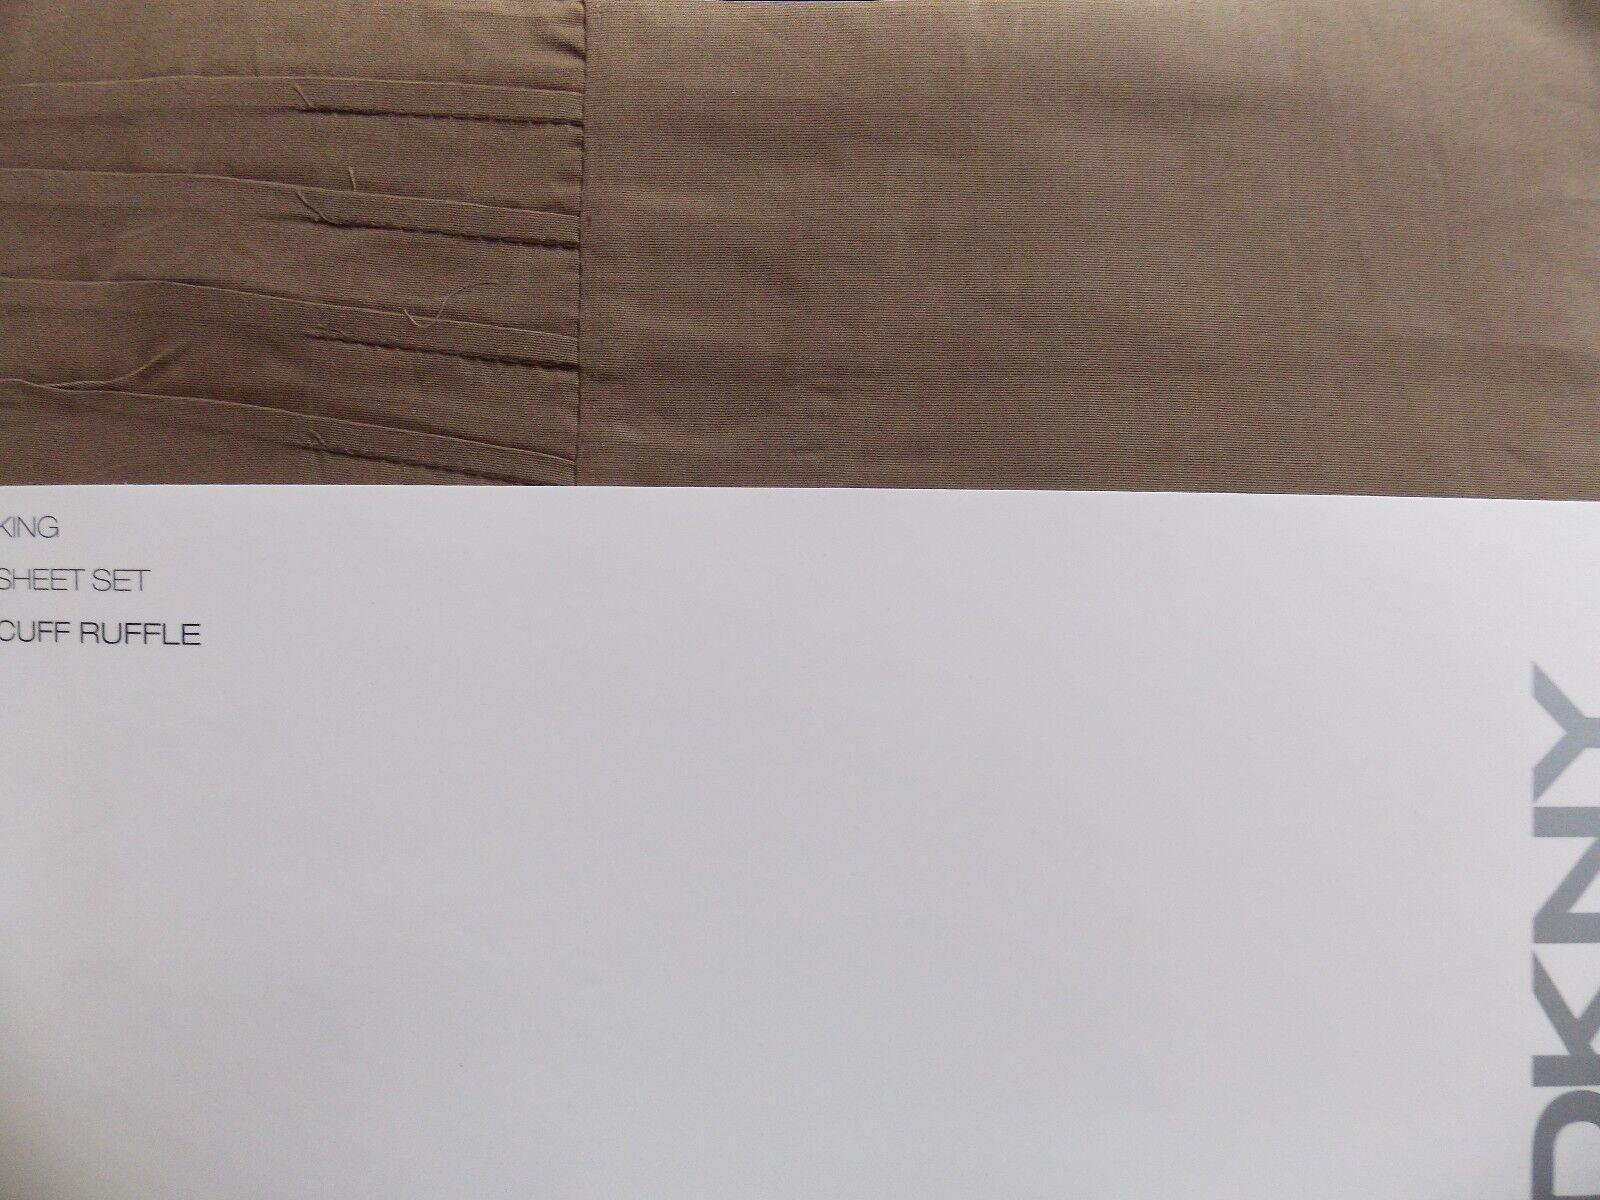 NEW DKNY CUFF RUFFLE CHOCOLATE  Marronee 4 PIECE KING  SHEET SET